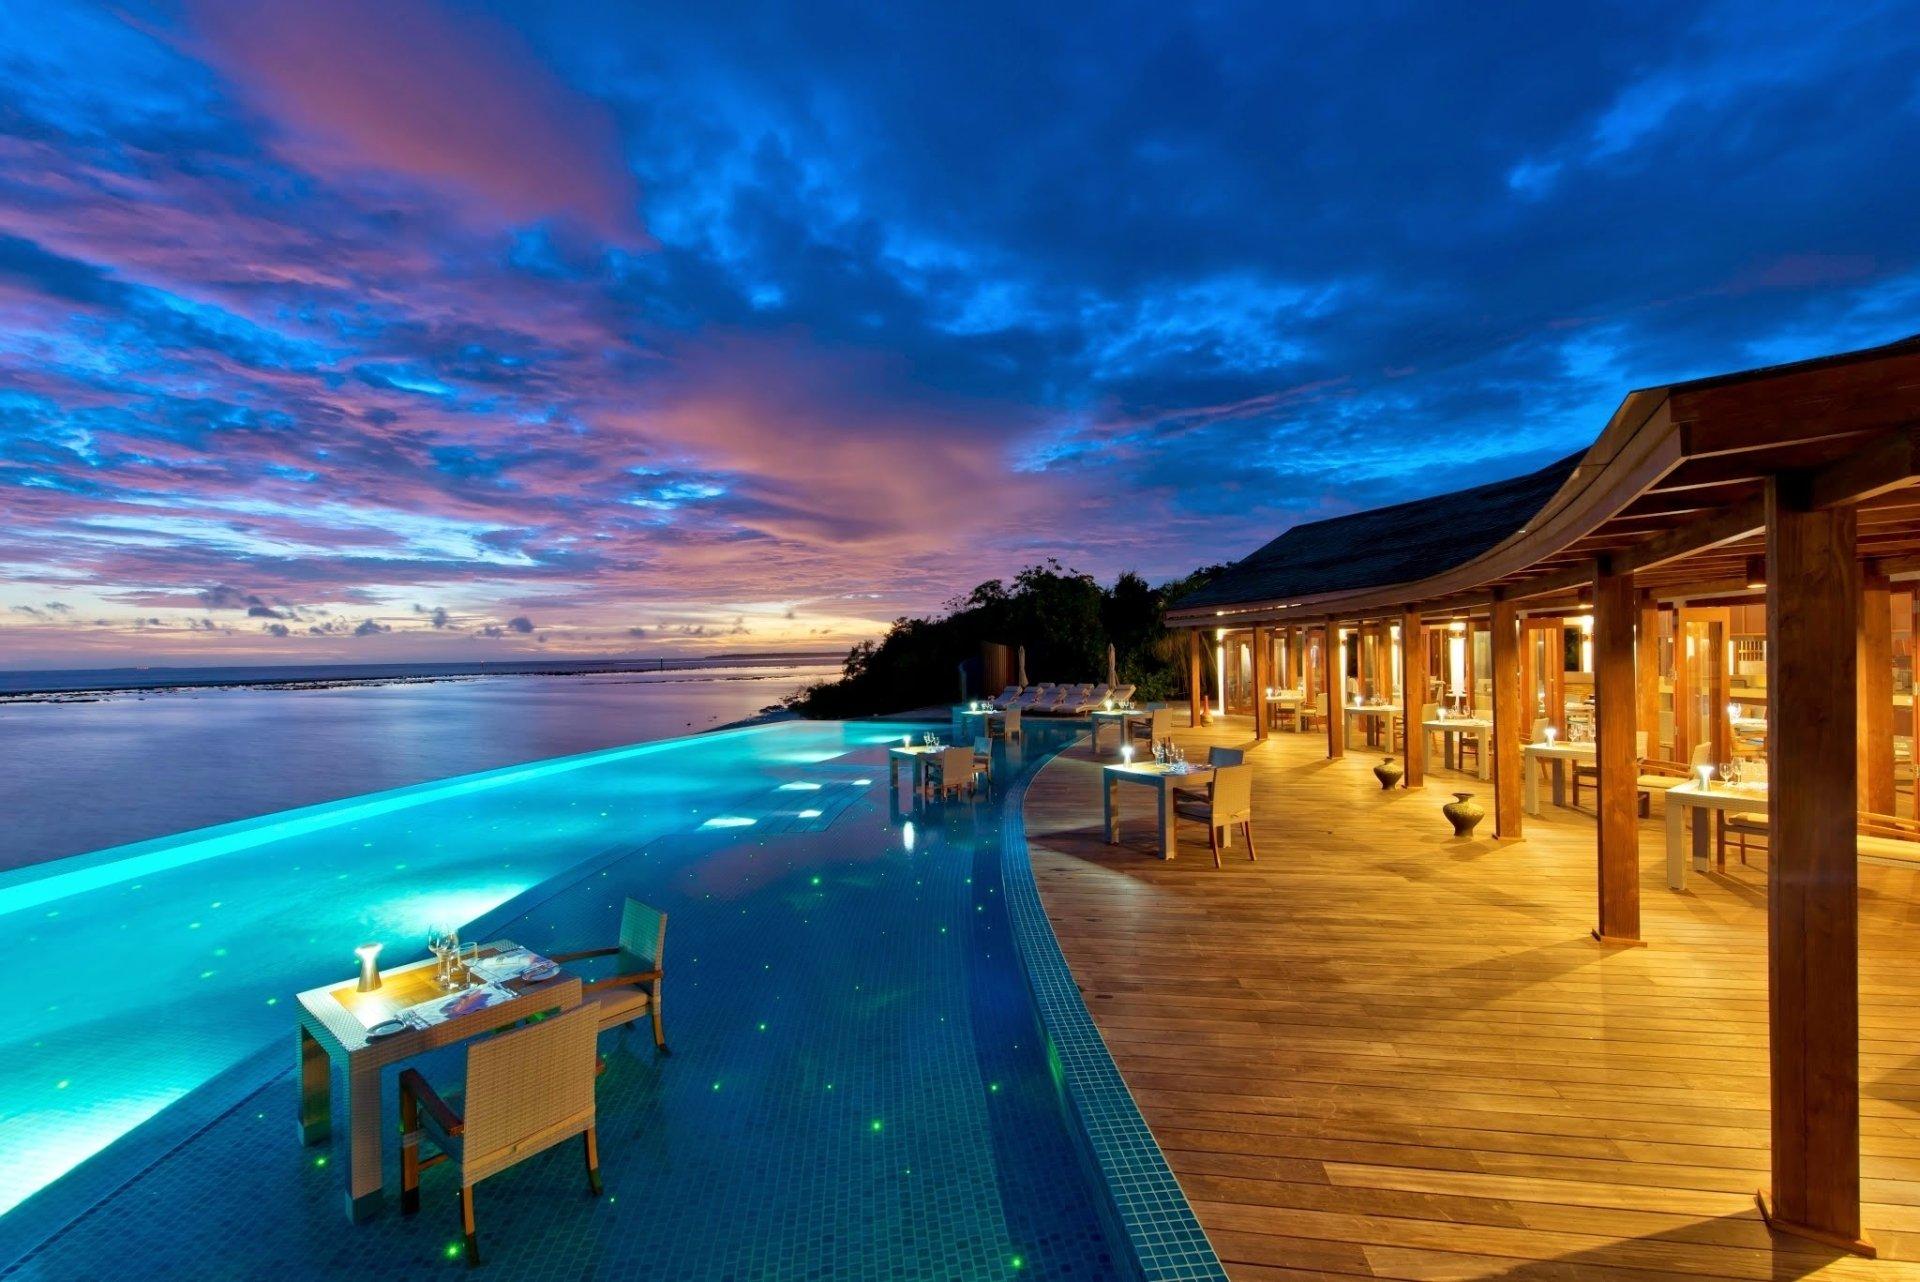 Man Made - Resort  Man Made Tropical Sunset Pool Wallpaper